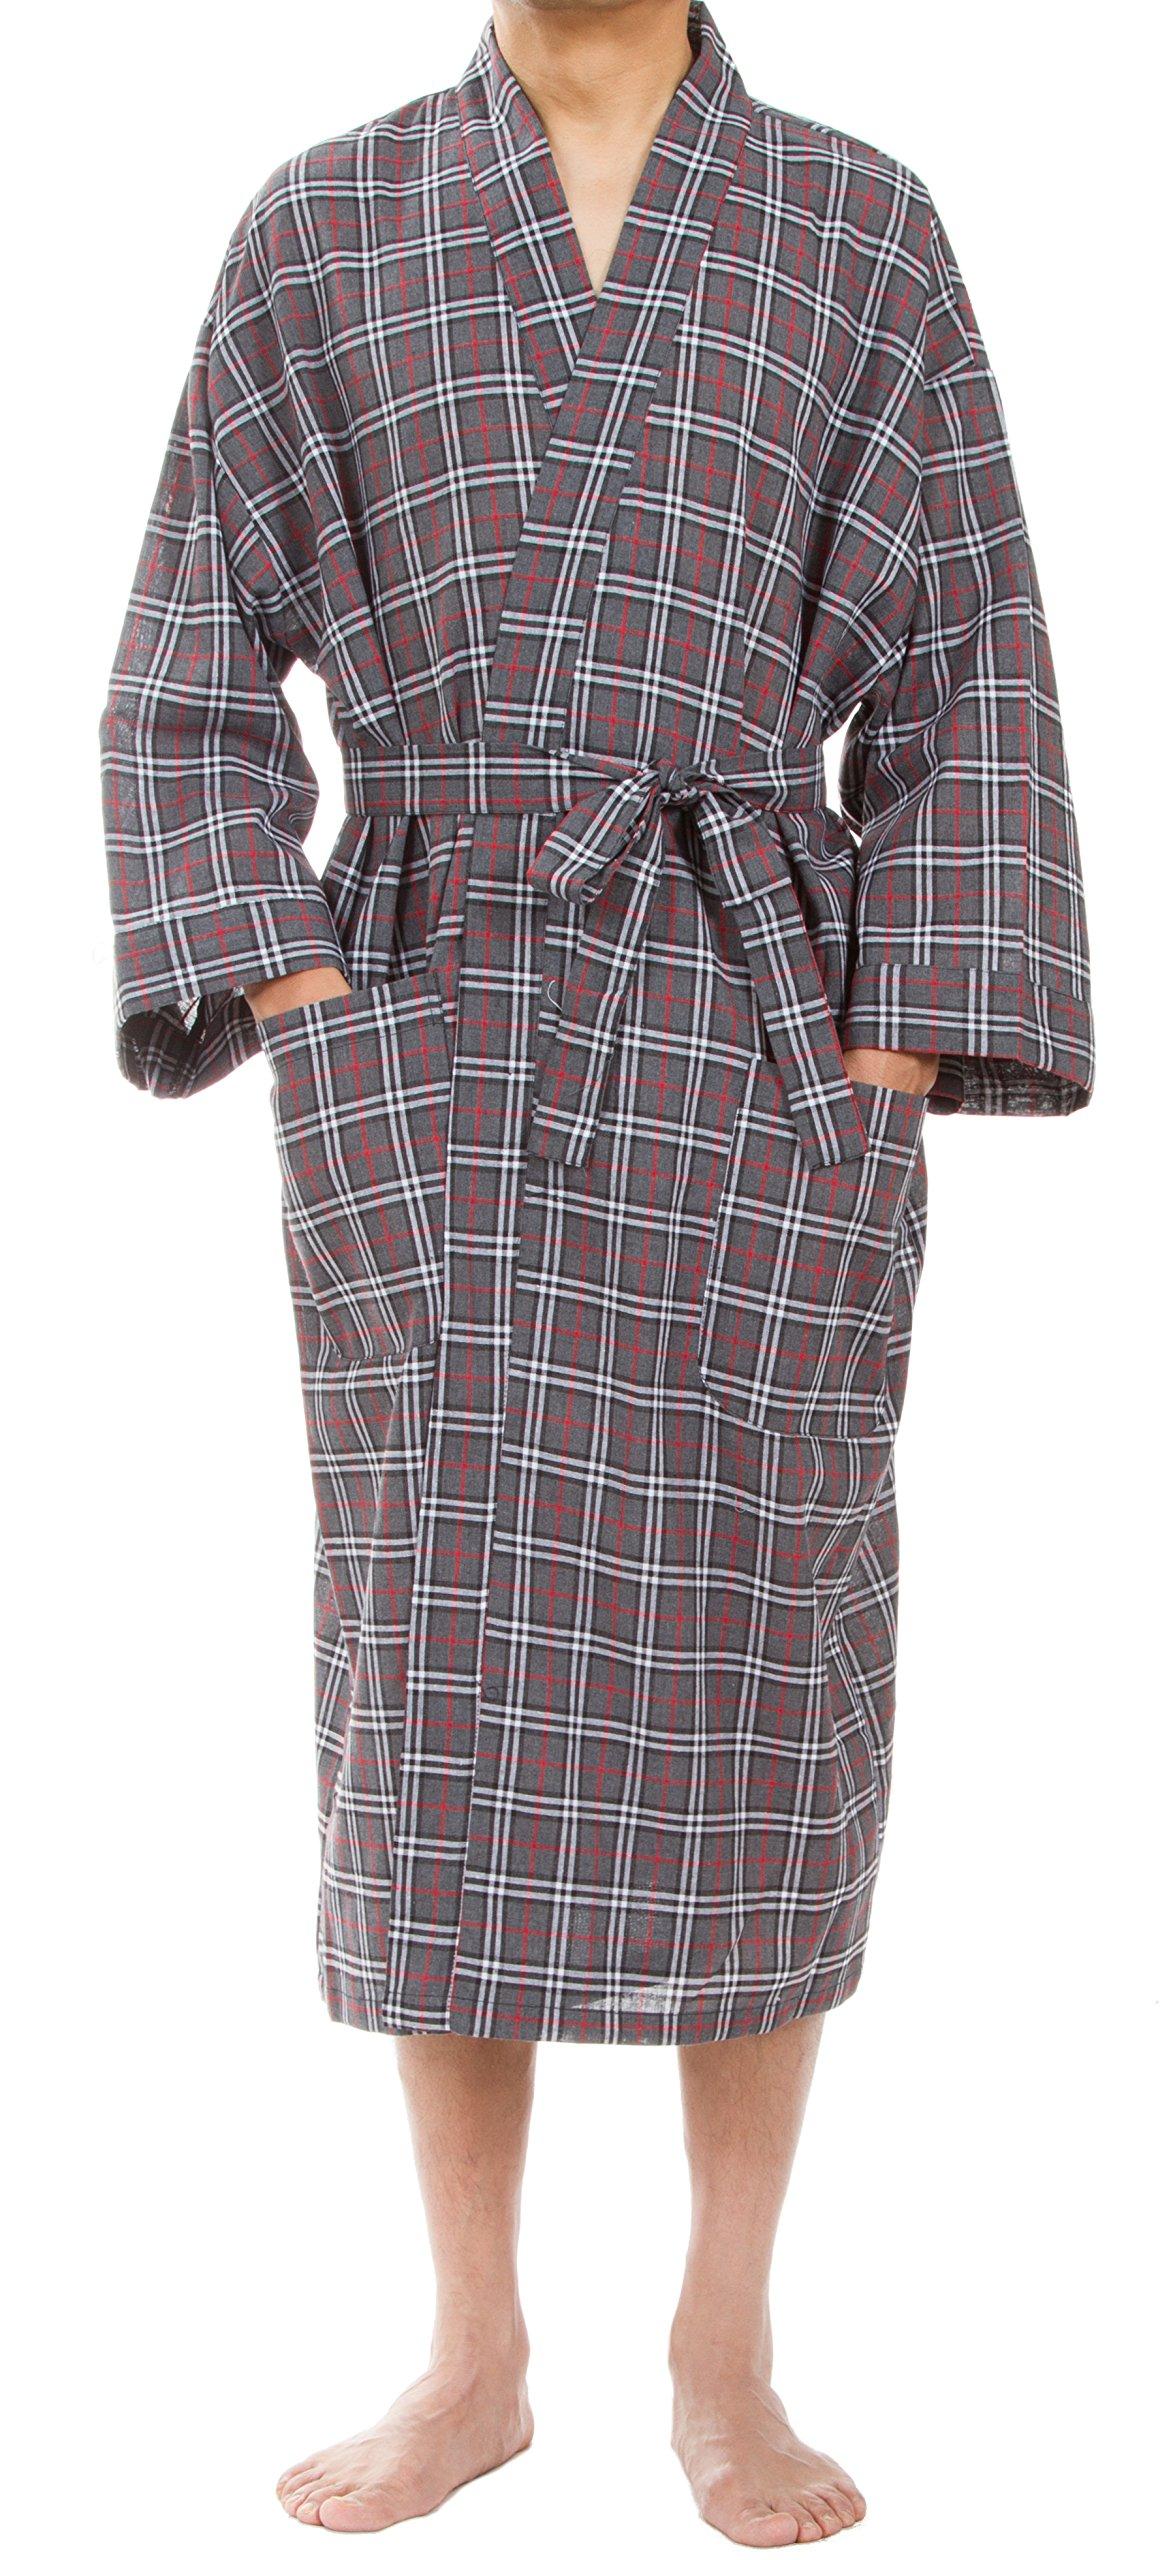 Leisureland Men's Plaid Robe, Woven Bathrobe for Sleep and Lounge, Gray Plaid